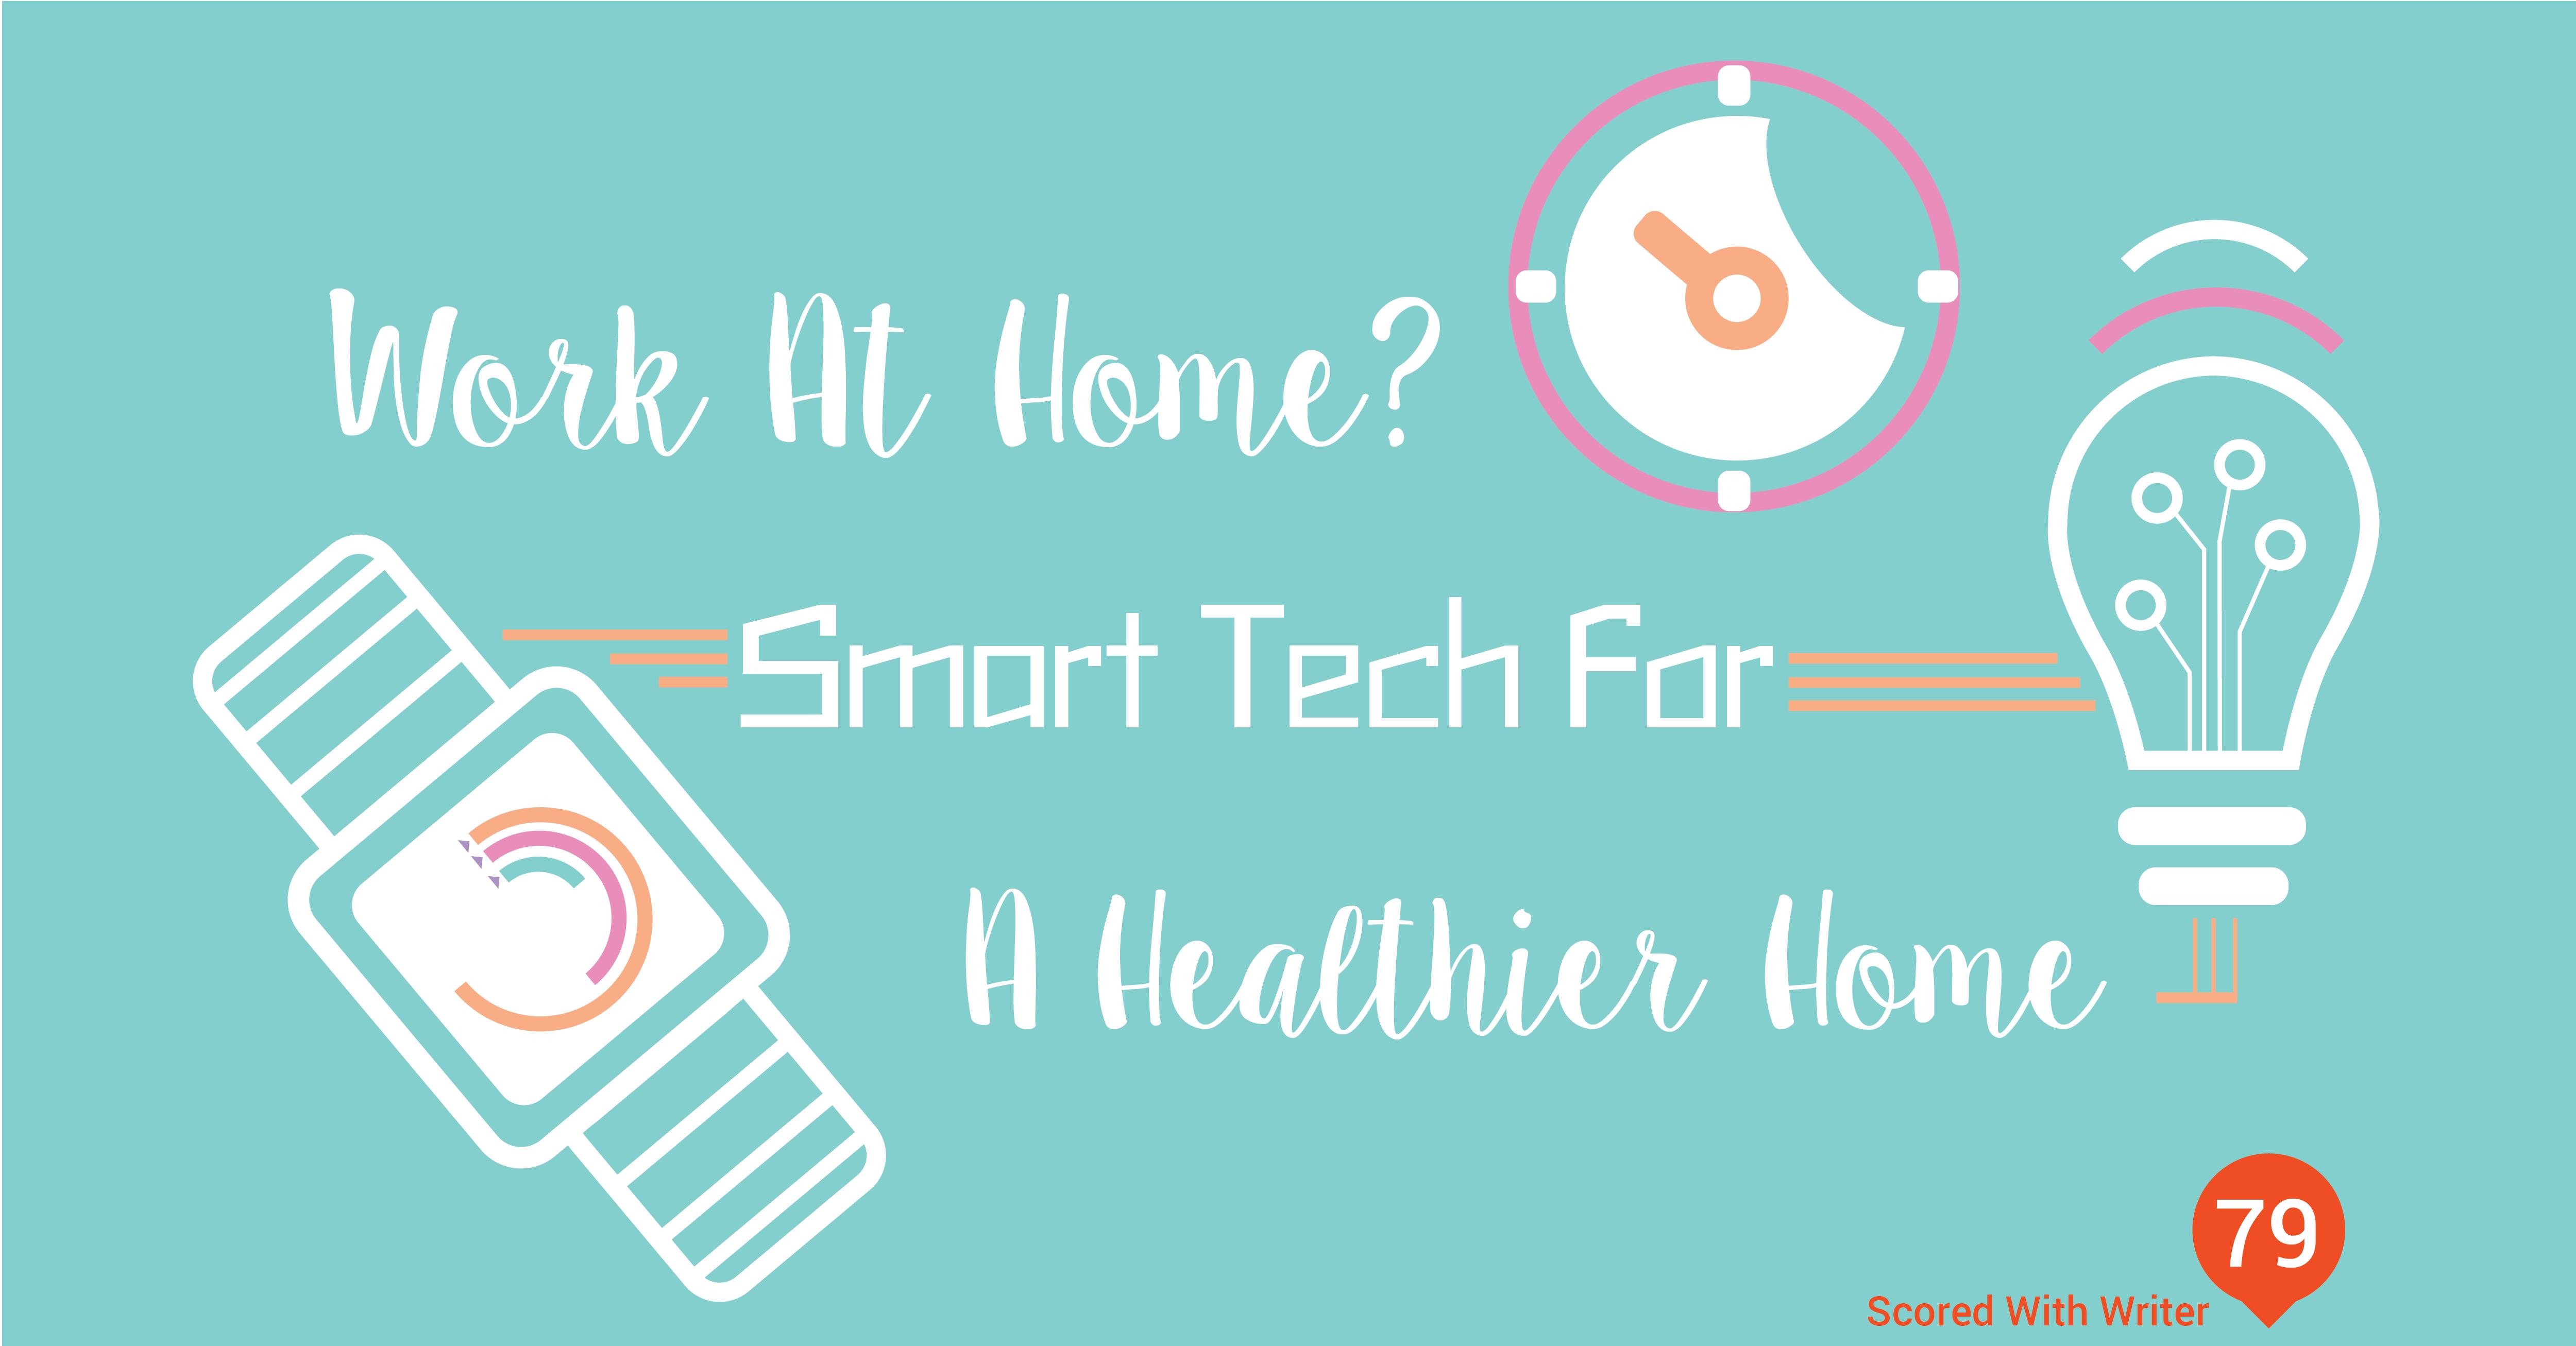 ARBlog_WorkAtHomeSmartTechForAHealthier-Home_Apr5_16.png